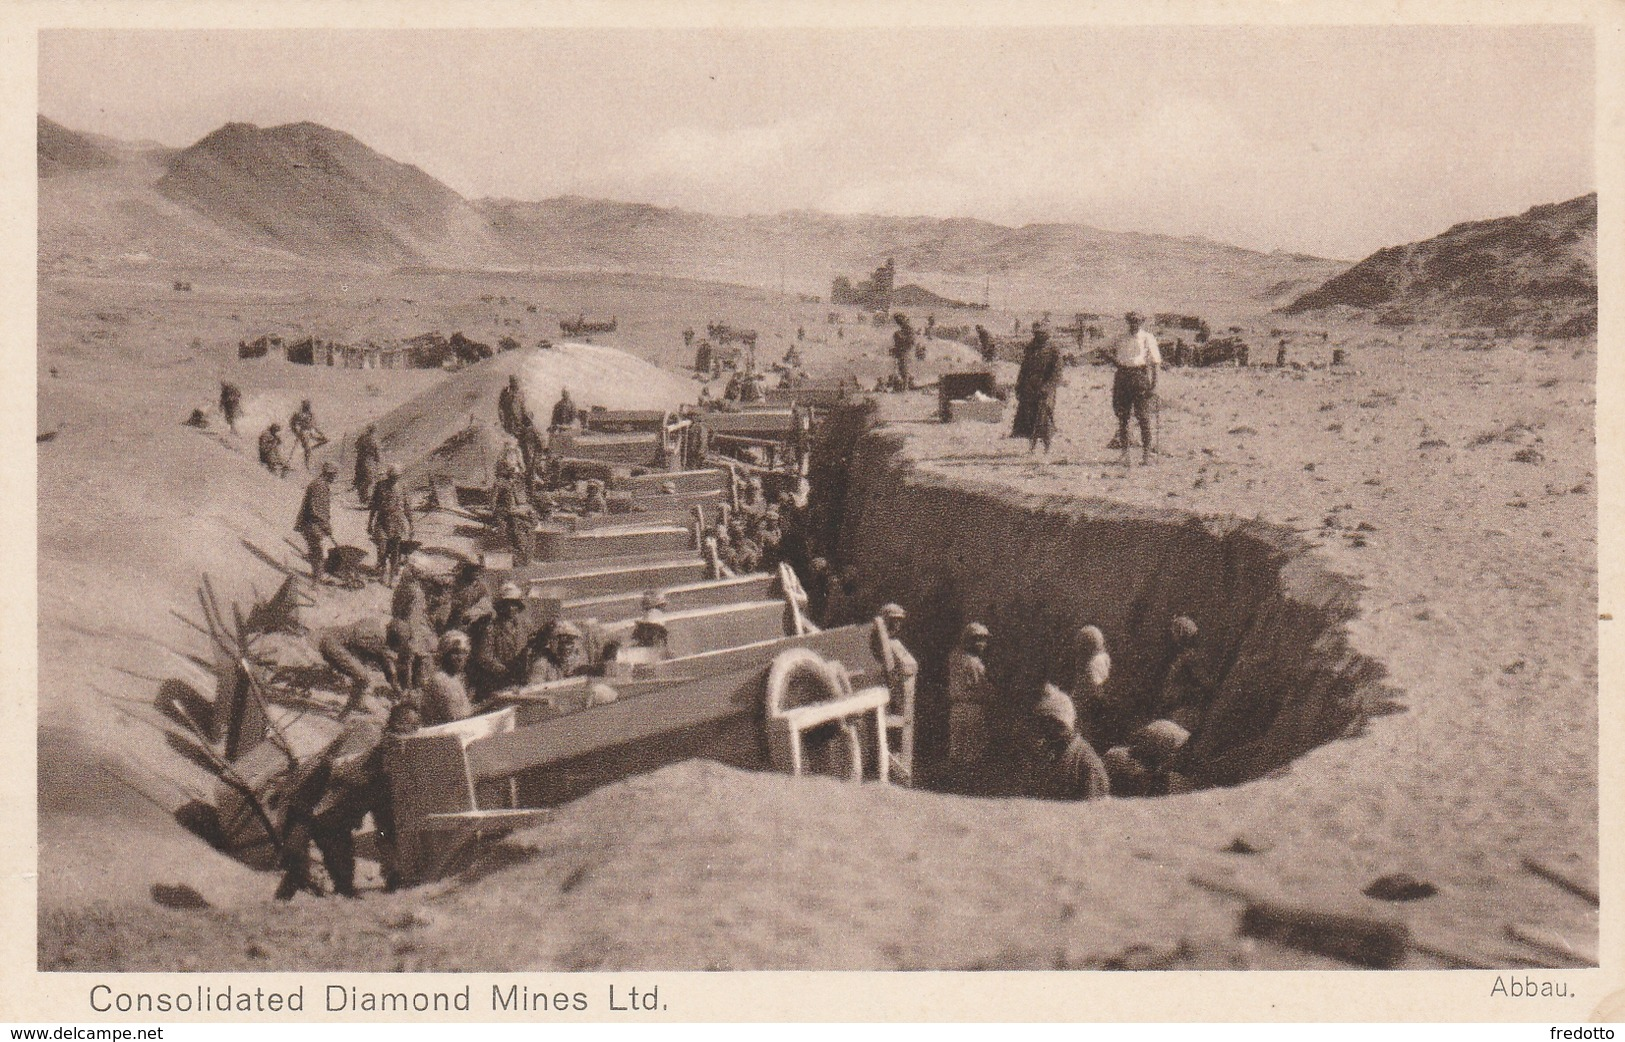 Deutsche Kolonie-Afrika-Consolidate Diamond Mines Ltd.-Abbau - Ehemalige Dt. Kolonien